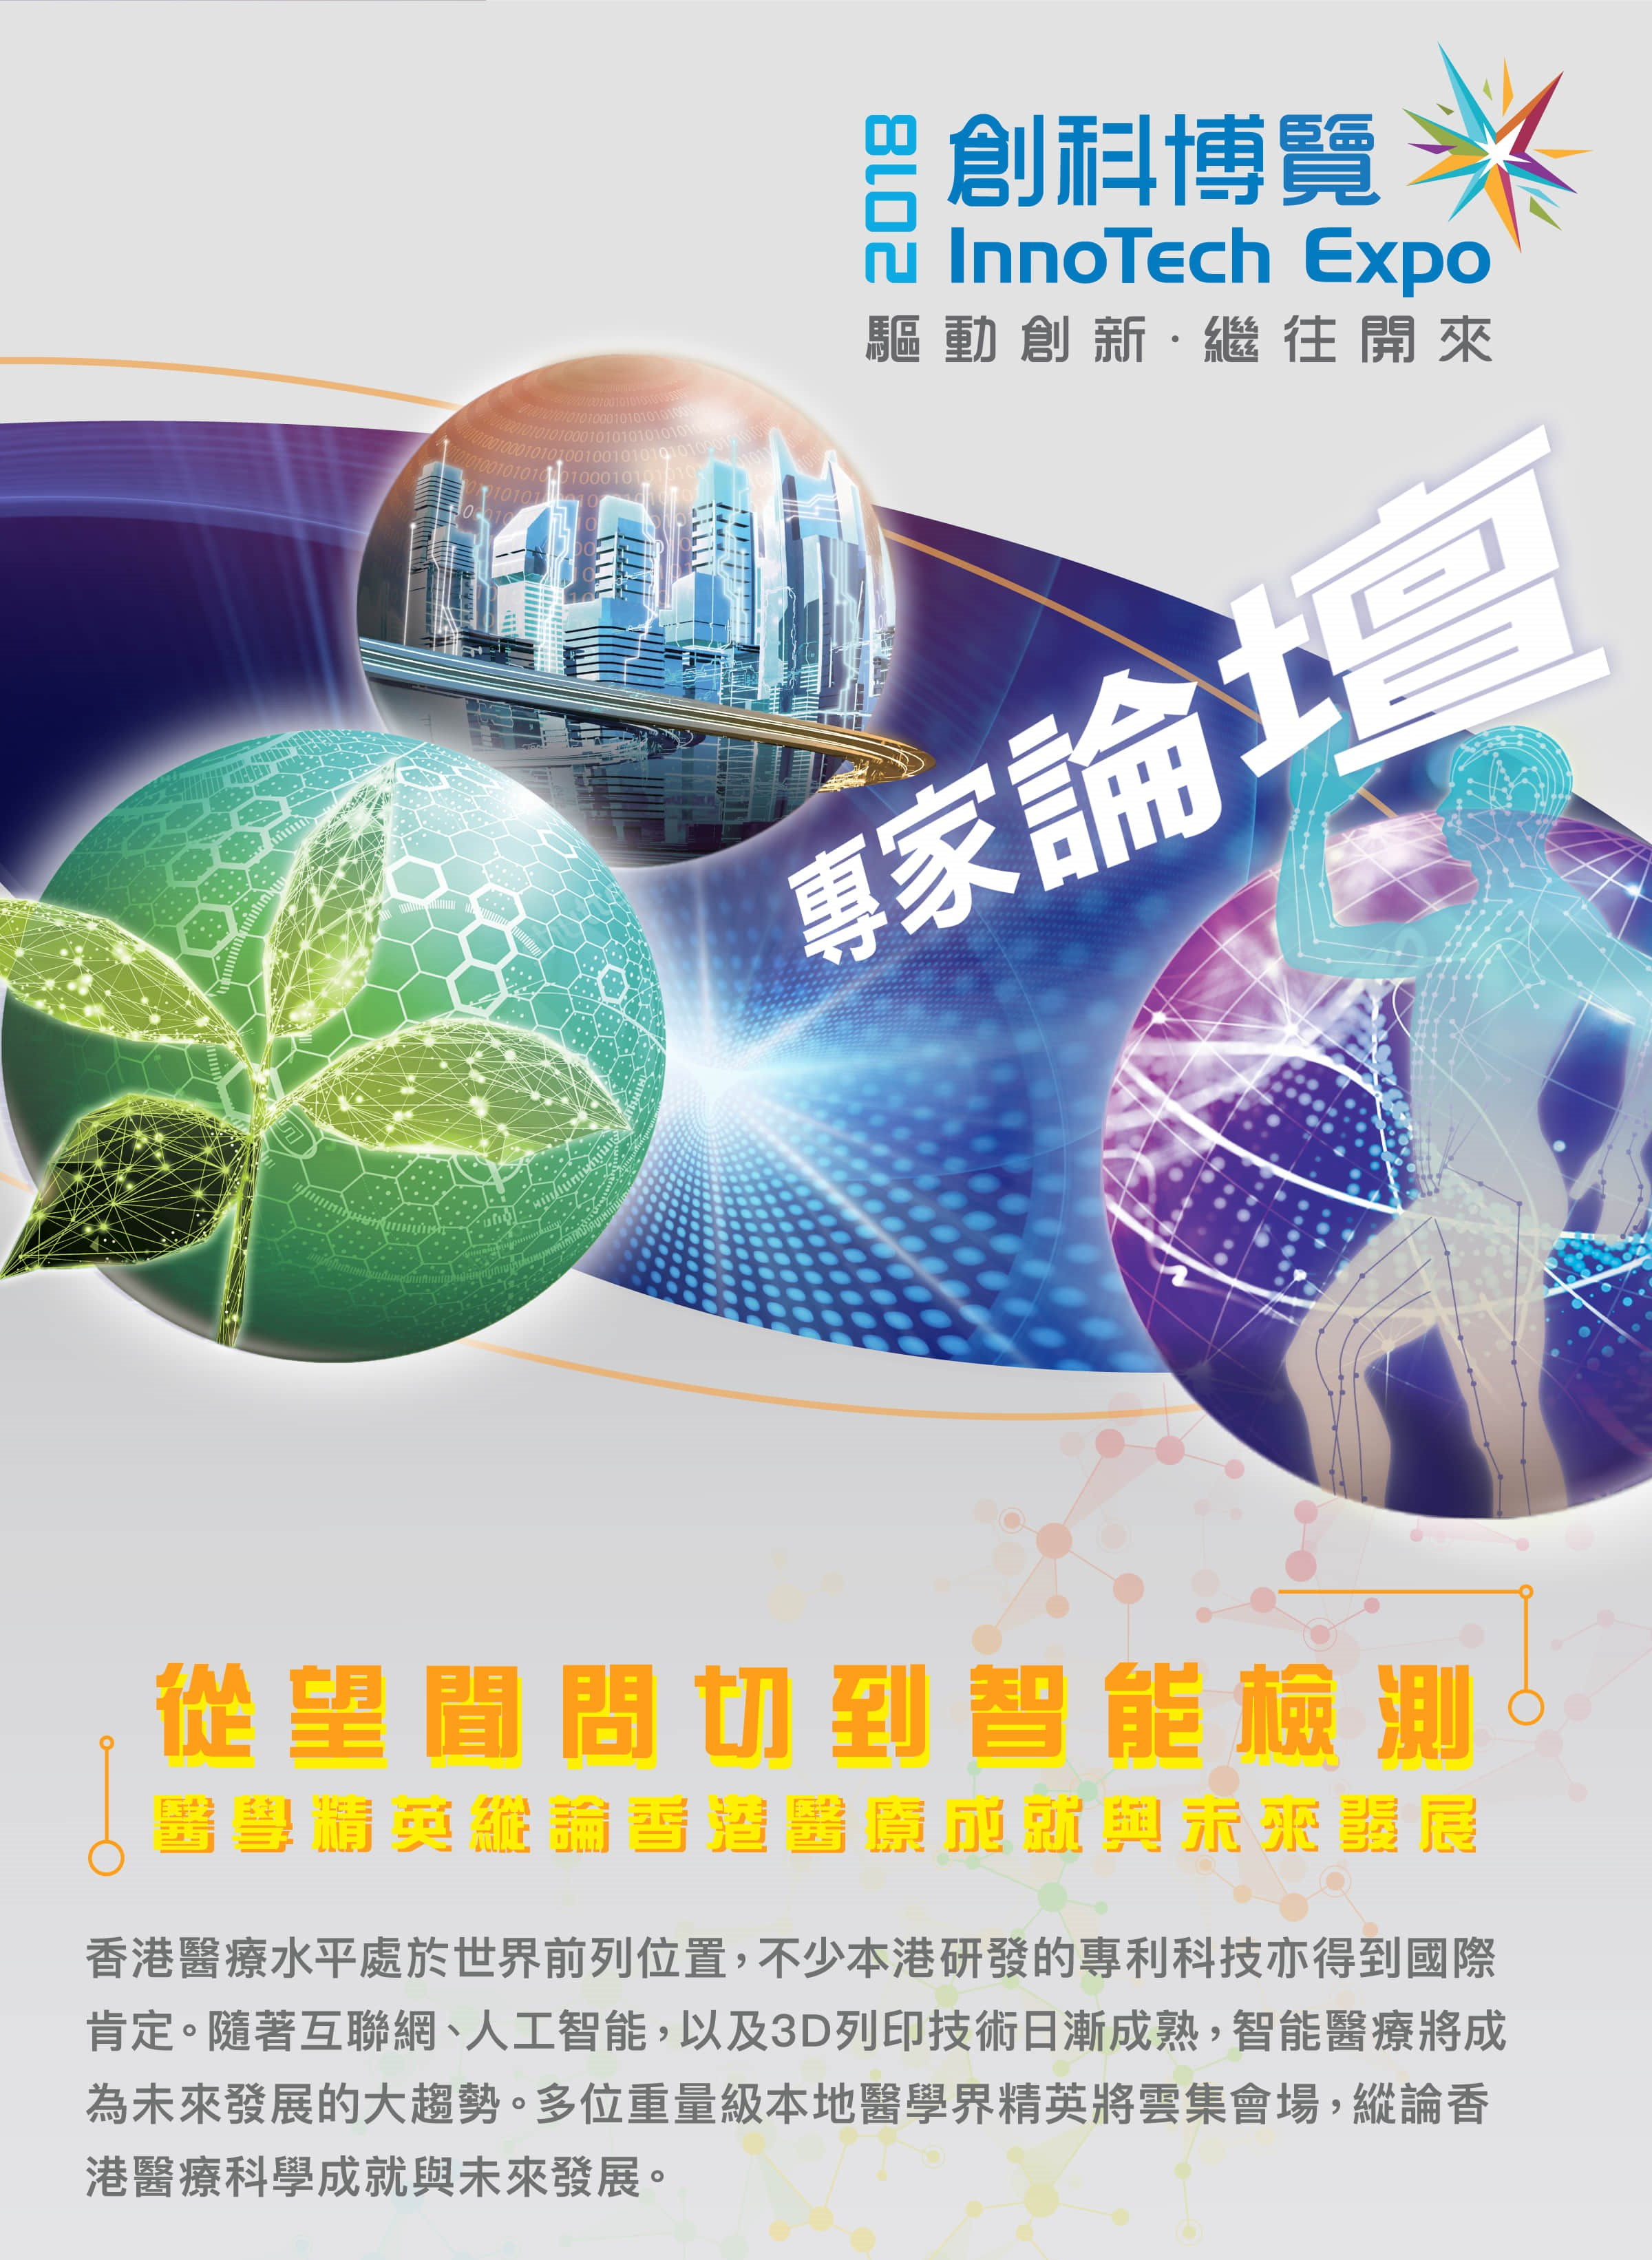 InnoTech Expo 2018 - 《香港醫療科學成就與未來發展》論壇, 26 September 2018